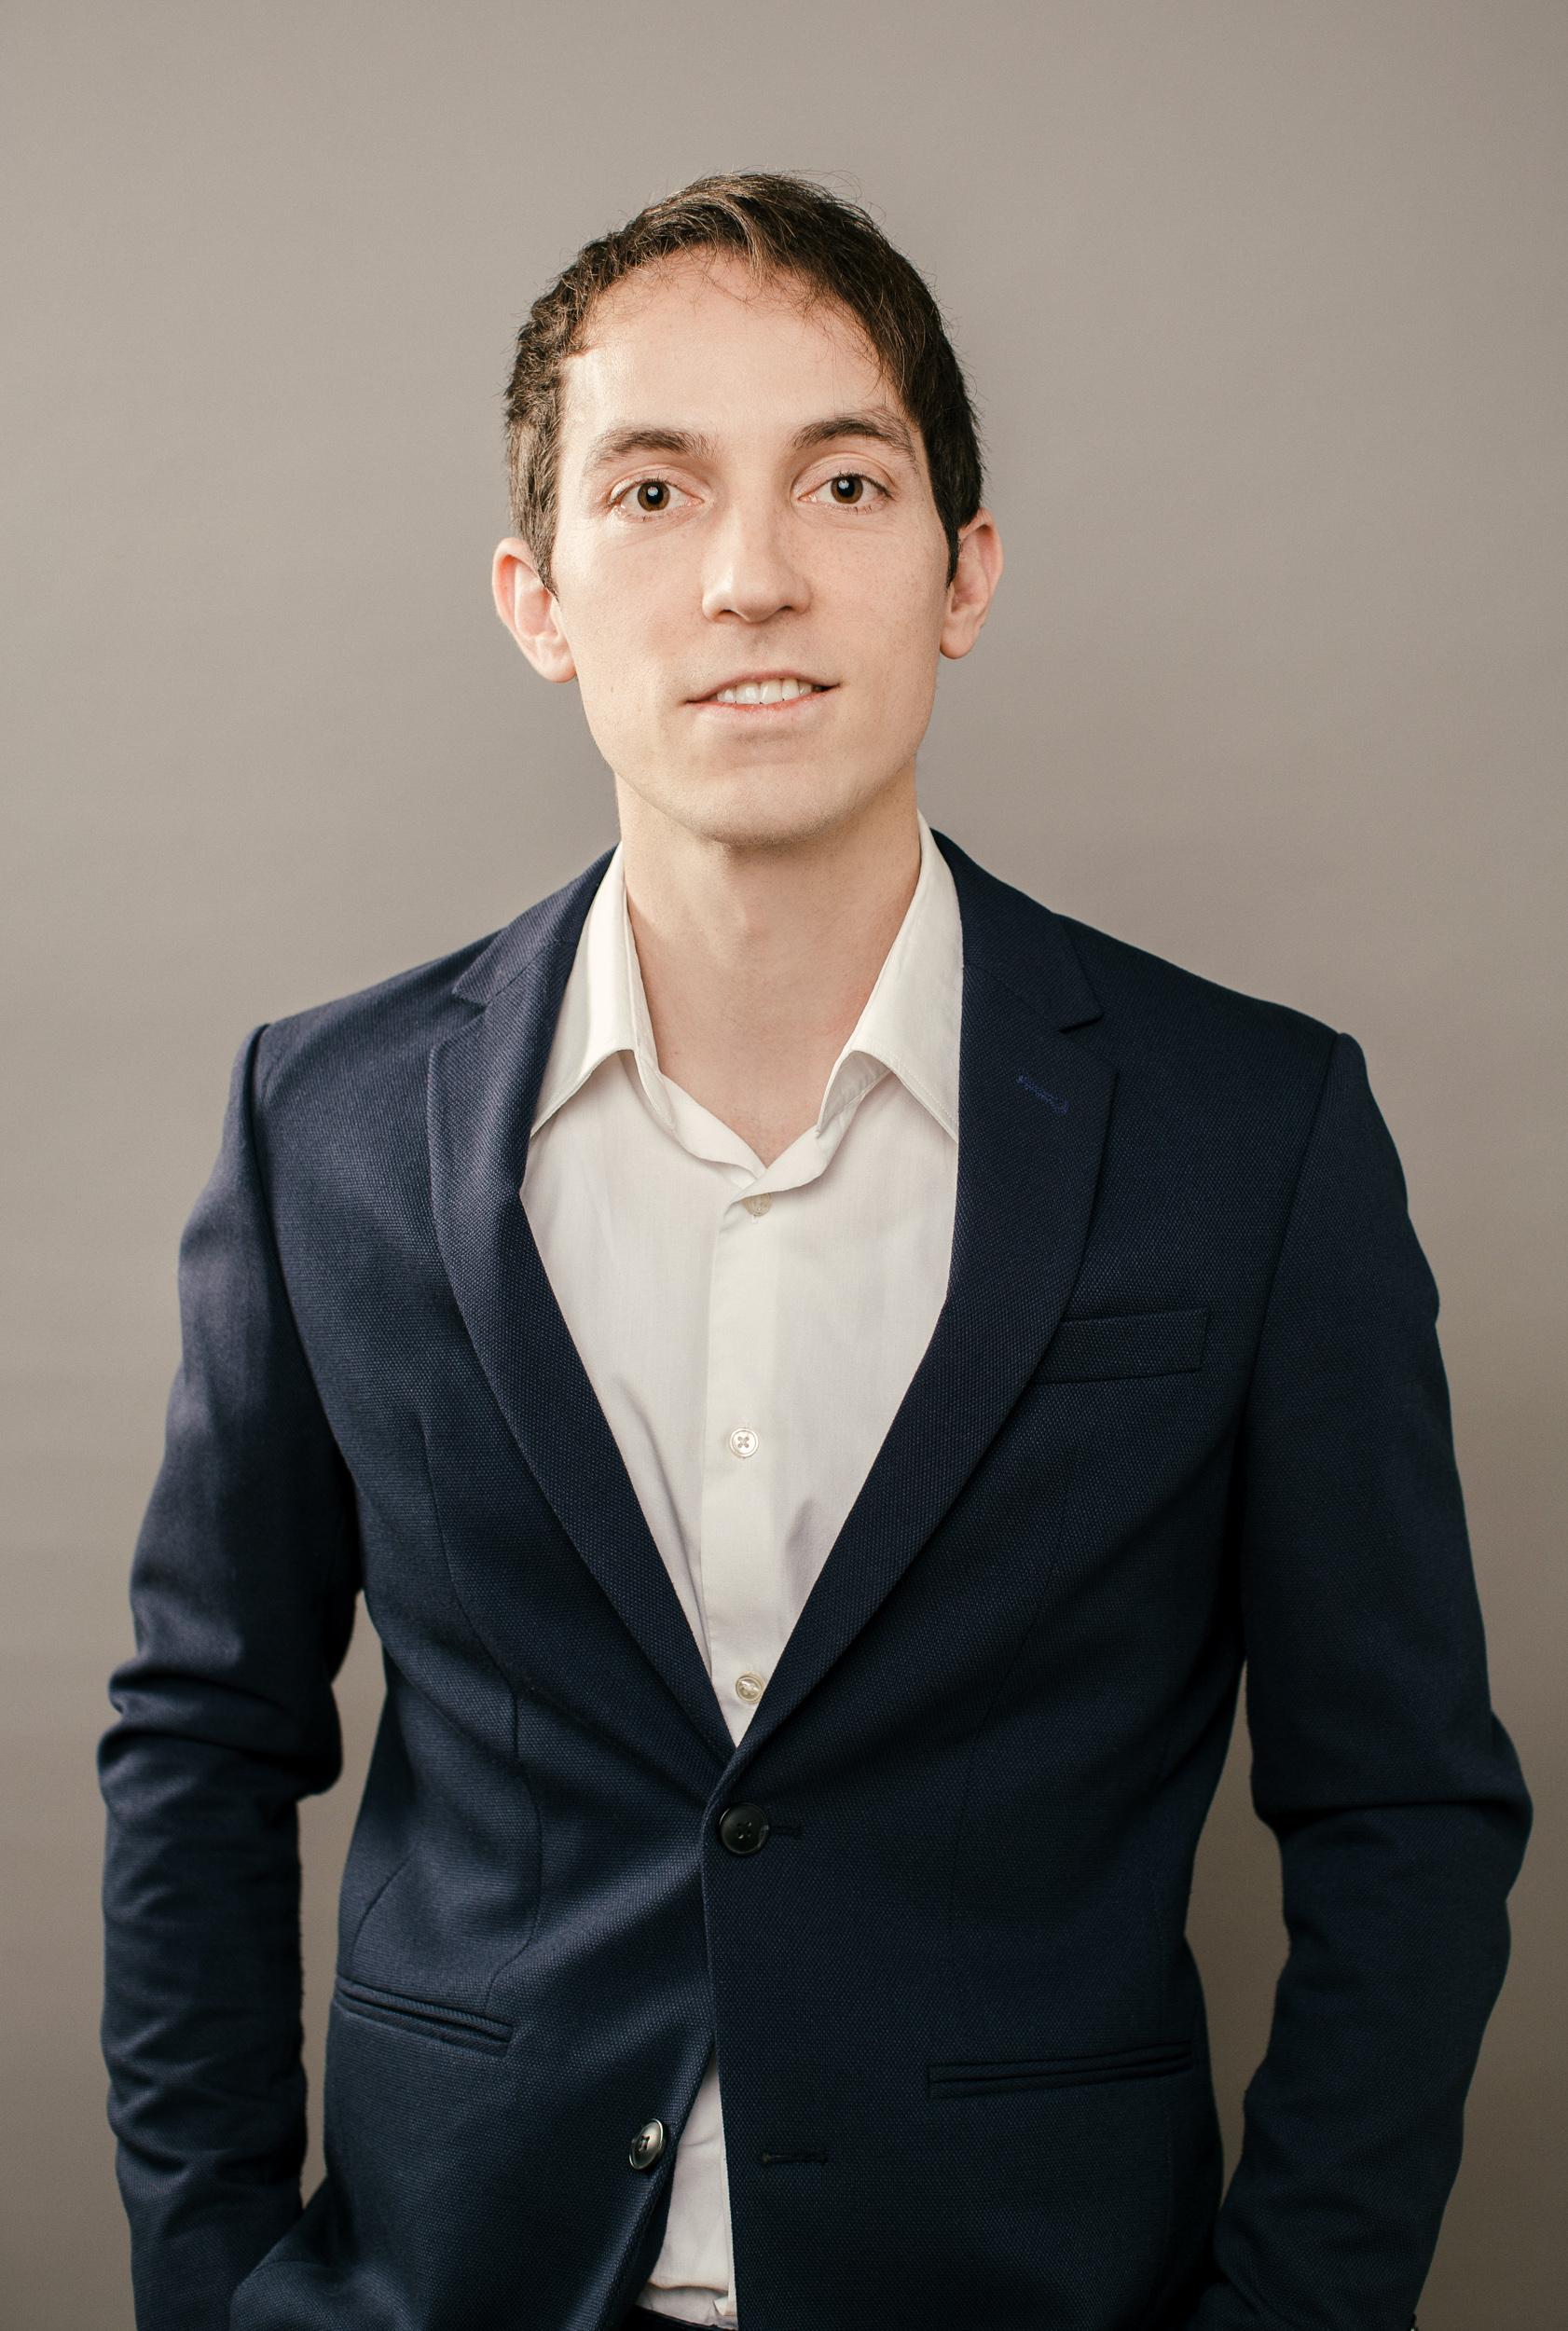 News Kontor - Business Portraits